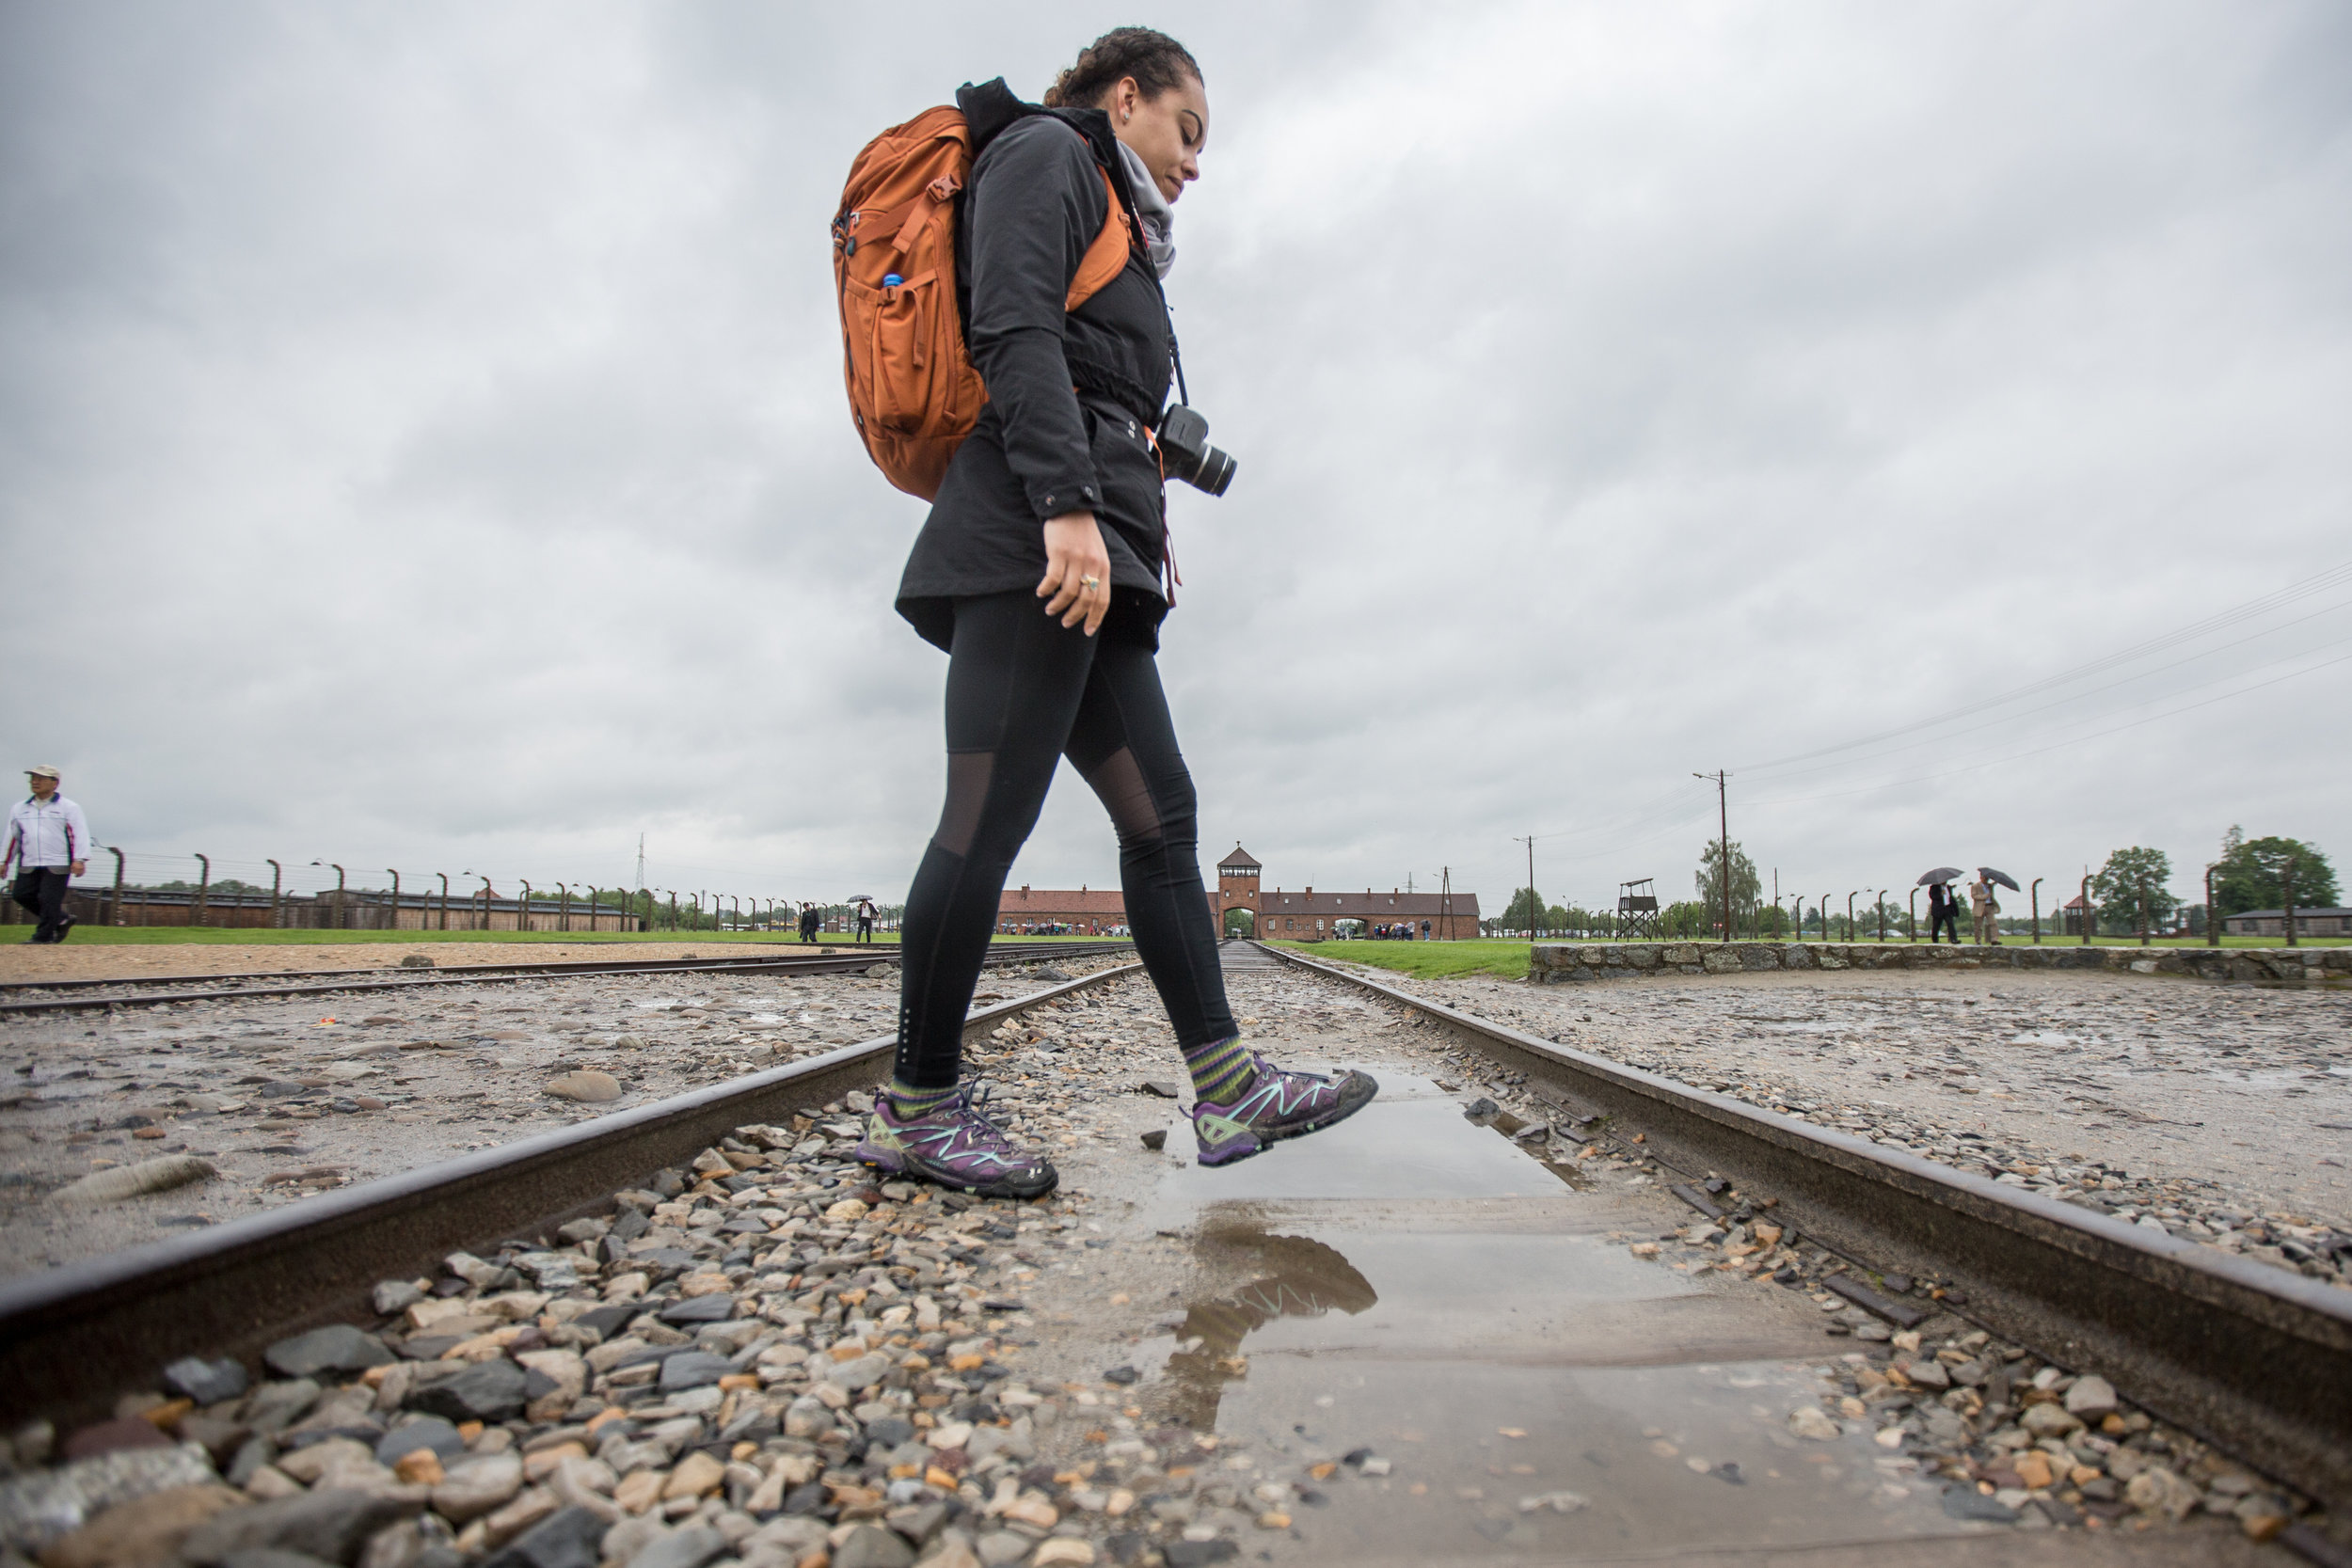 Cheyenne Paris walks on the tracks at Birkenau on May 29, 2019.